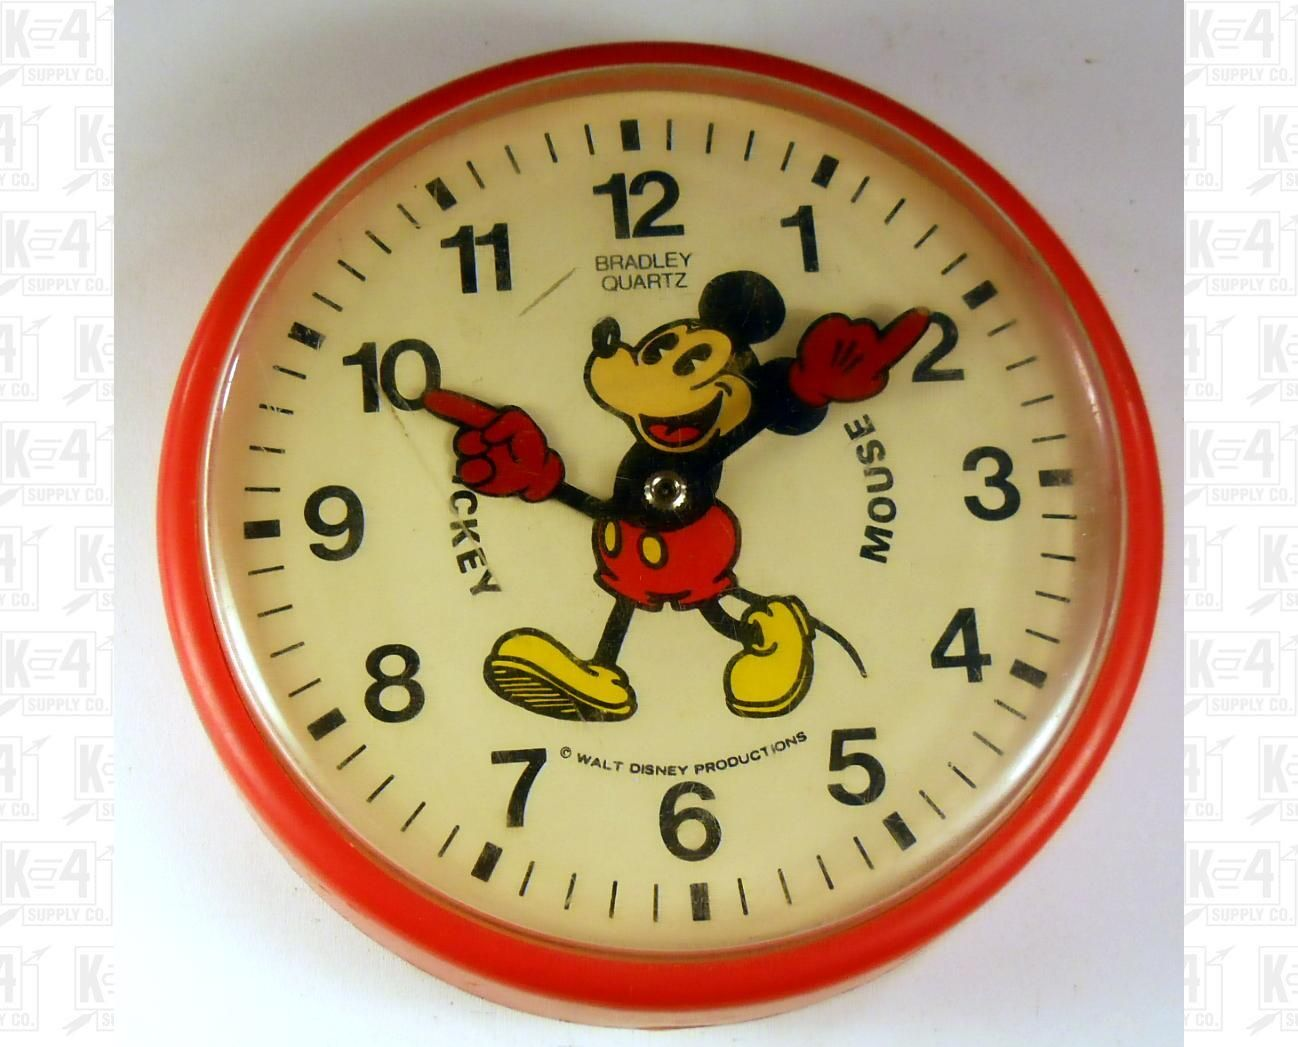 Bradley walt disney mickey mouse wall clock shop bonanza bradley walt disney mickey mouse wall clock amipublicfo Choice Image